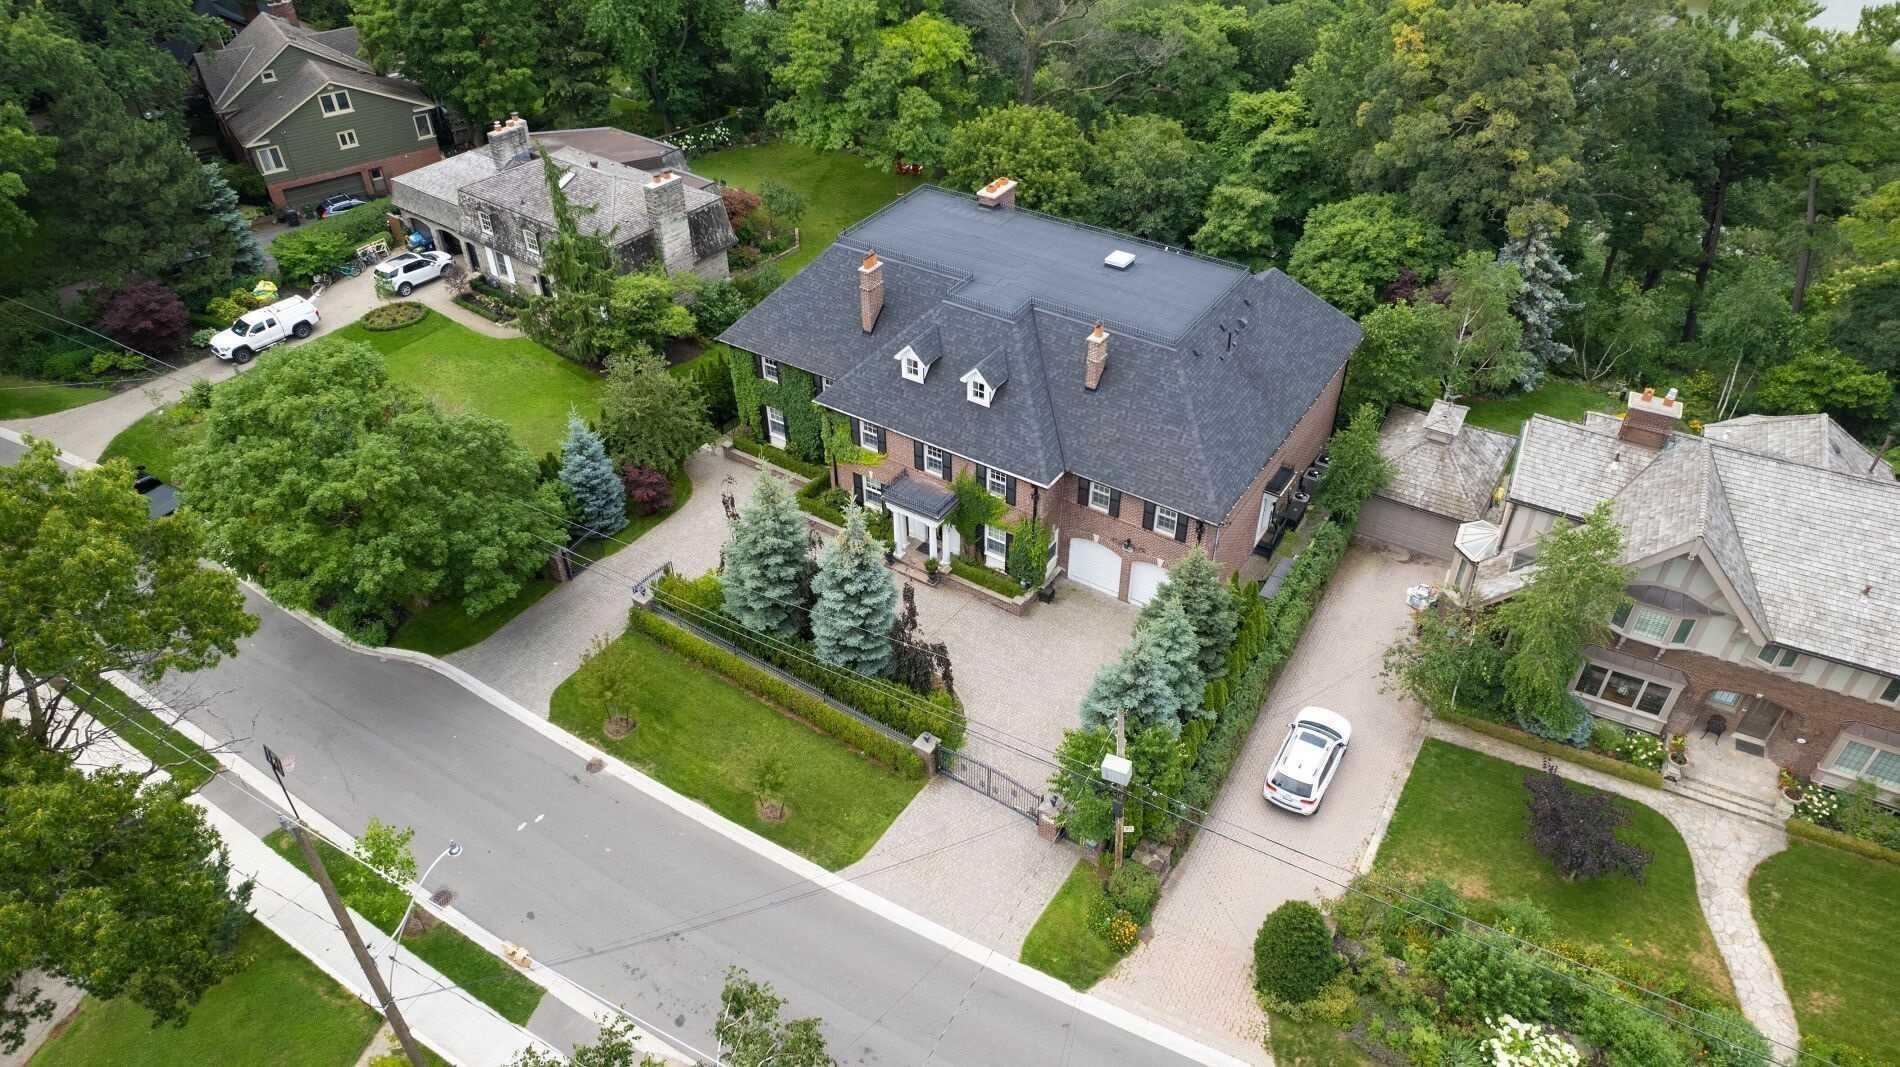 246 Riverside Dr, Toronto, Ontario M6S4A9, 6 Bedrooms Bedrooms, 14 Rooms Rooms,7 BathroomsBathrooms,Detached,For Sale,Riverside,W5375451